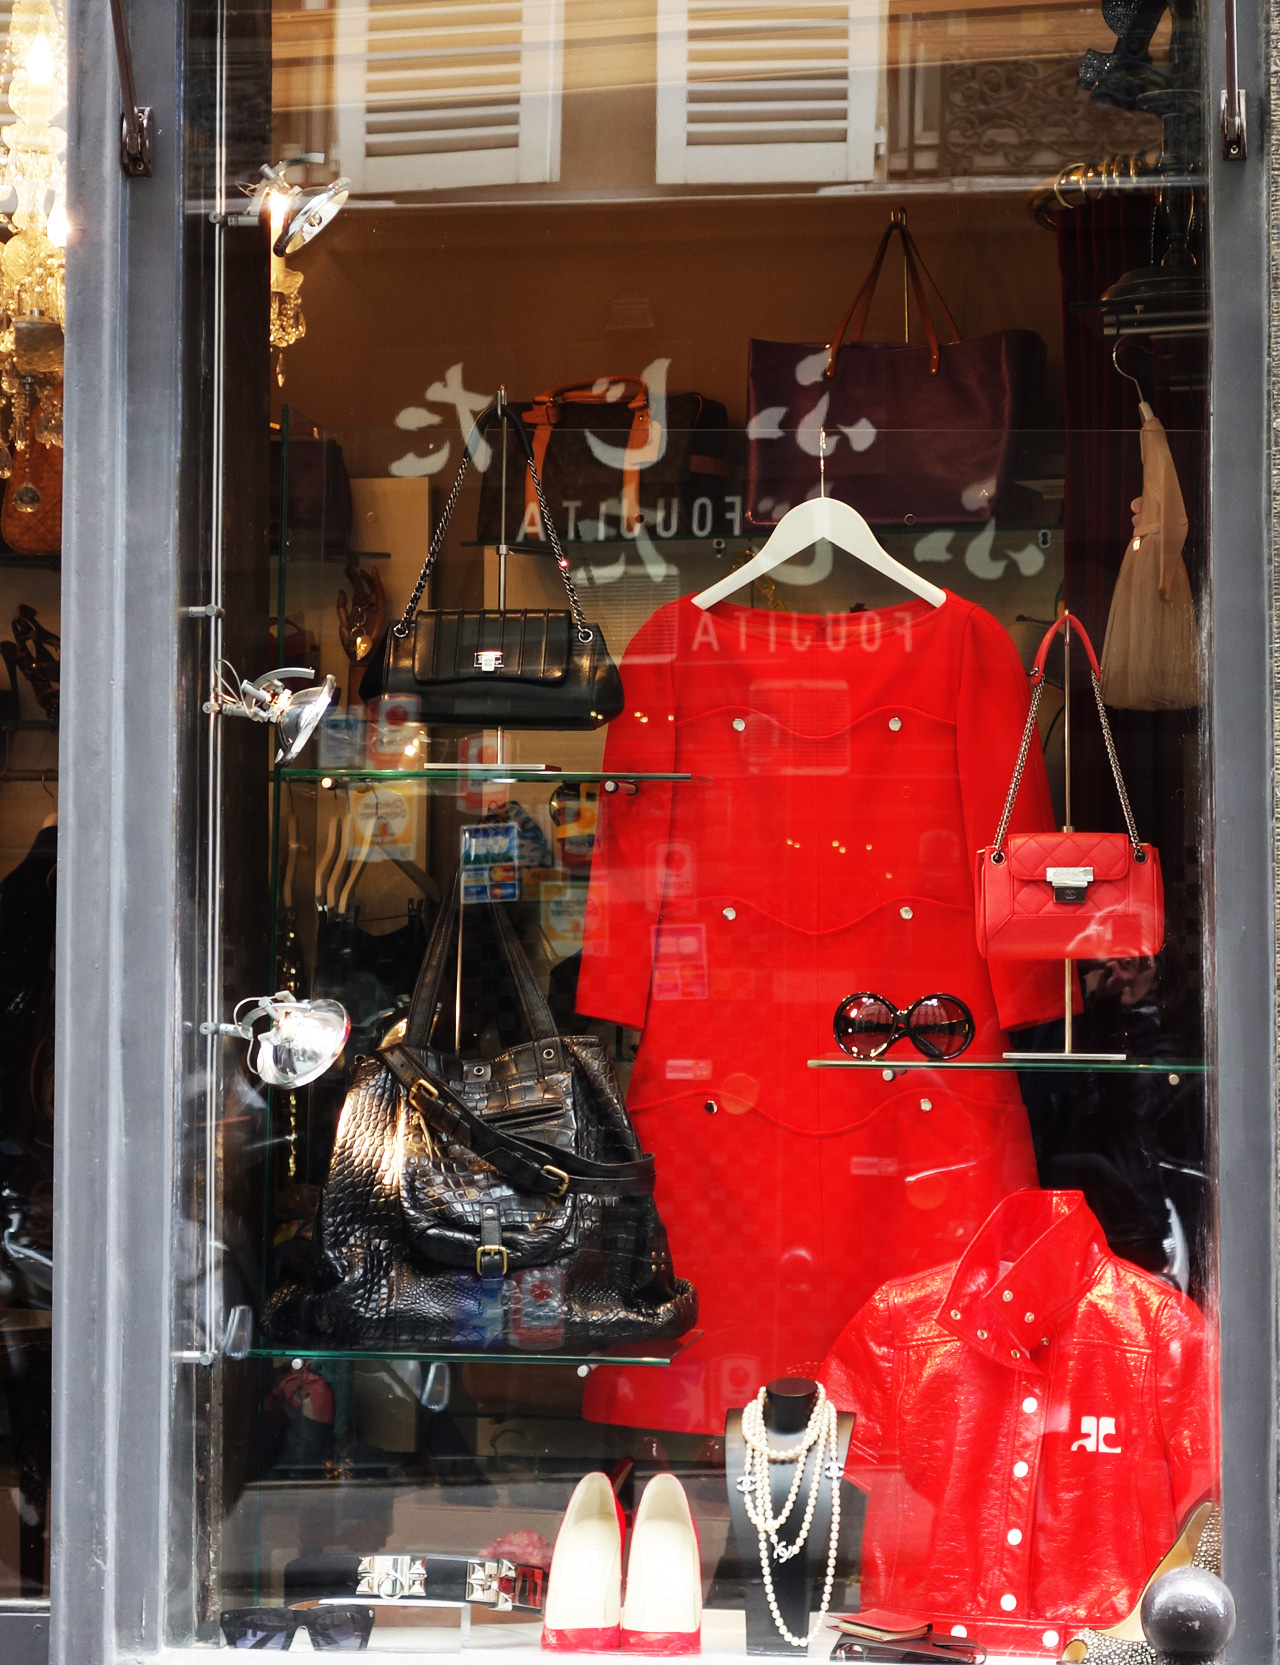 09_MB-select-Boutique-vitrine-droite